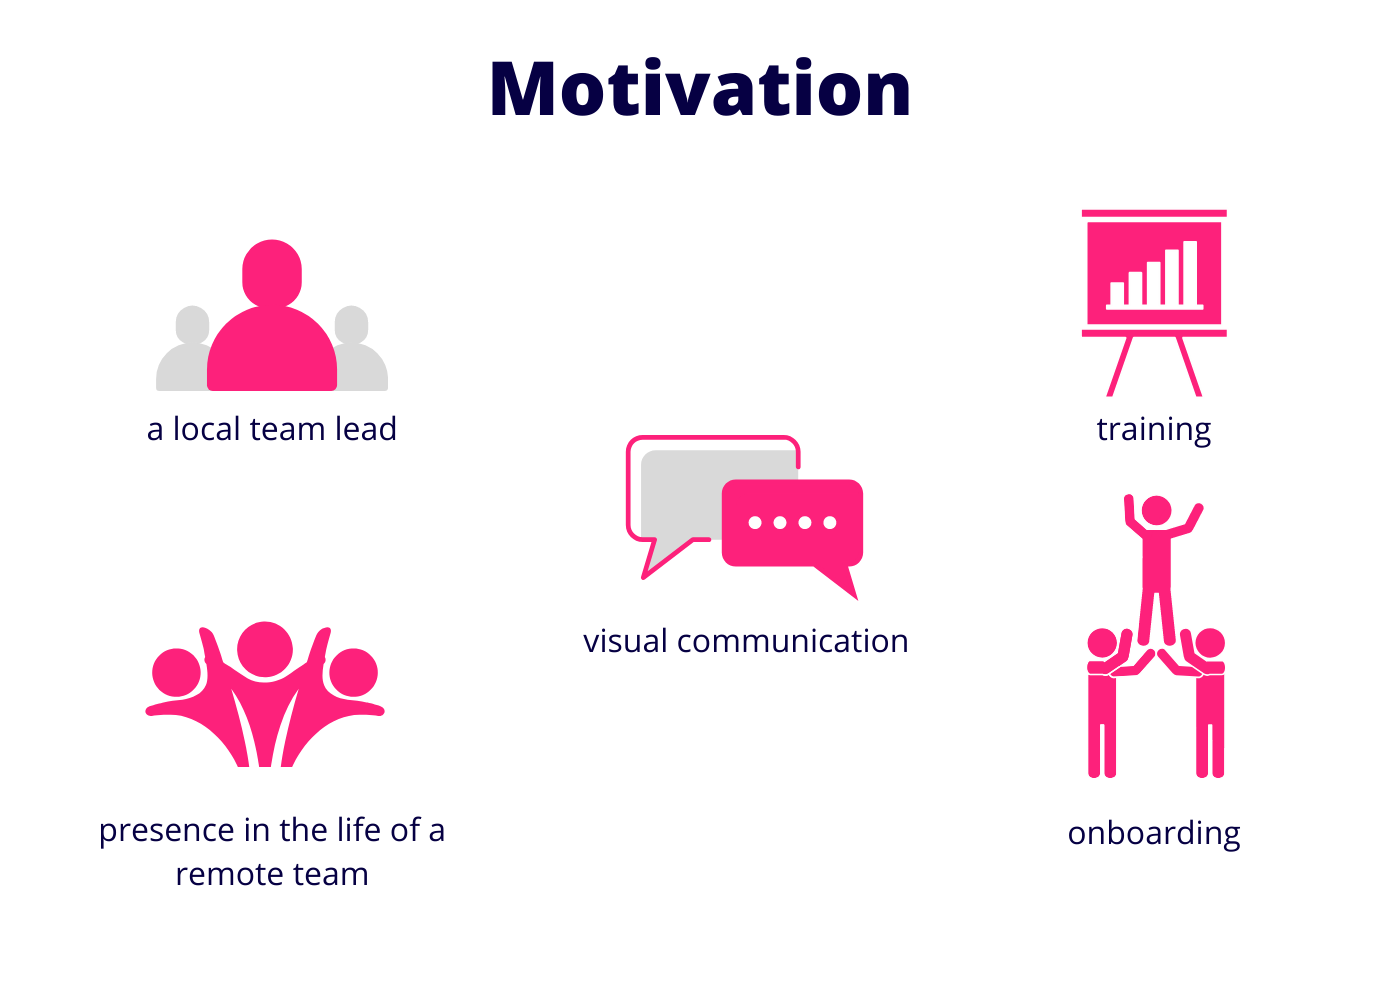 Motivate your remote team